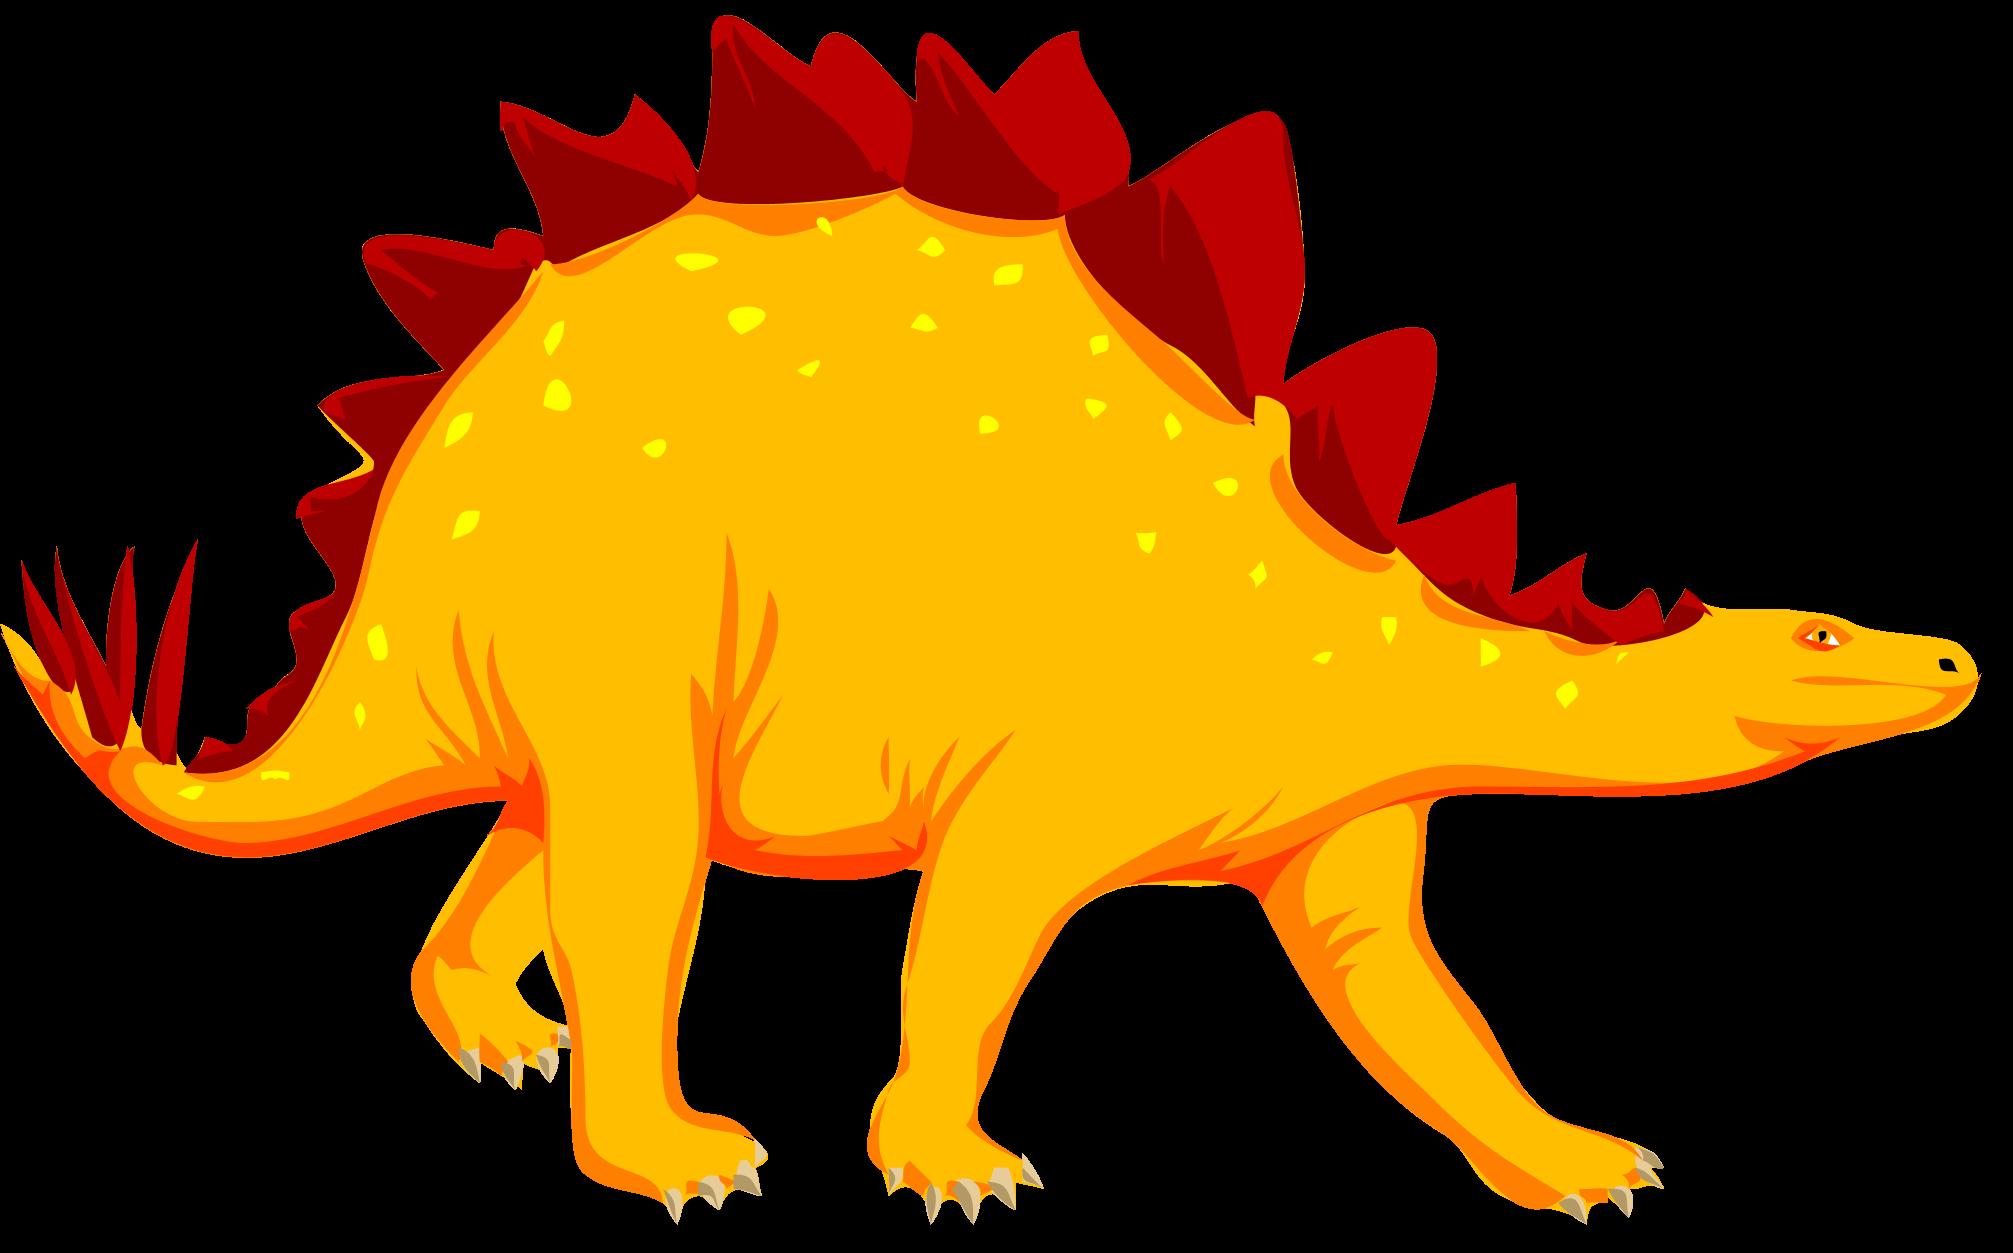 Uncategorized Dinosaur Pictures For Kids dinosaur party free books childrens stories online storyjumper 24